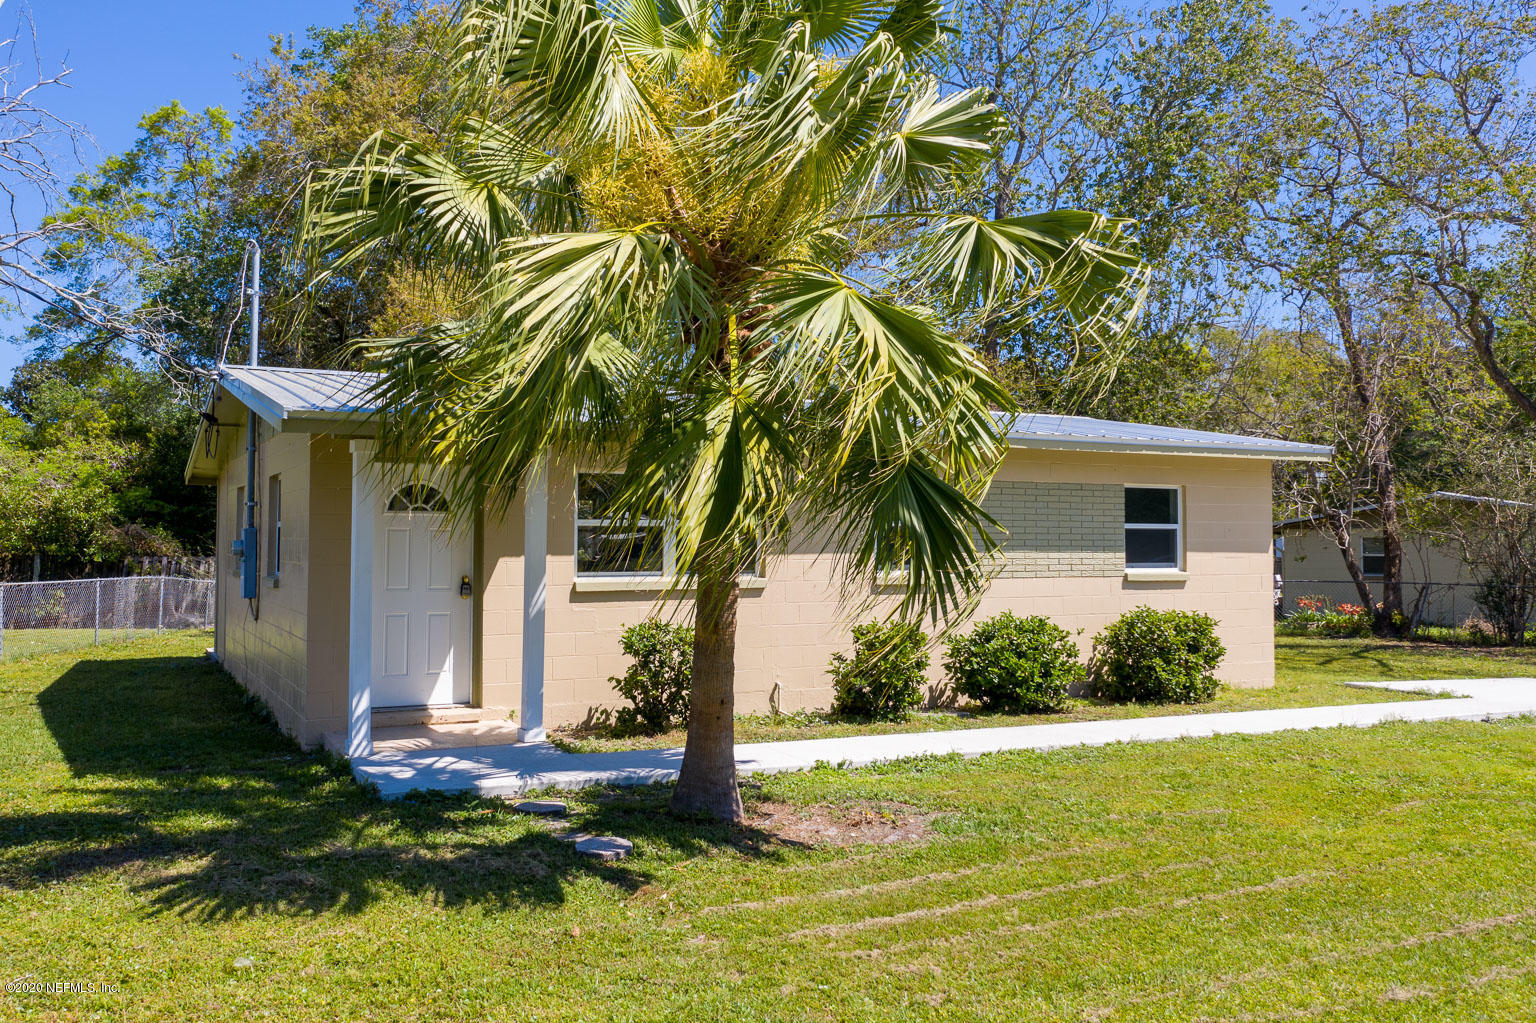 333 WILDWOOD, ORANGE PARK, FLORIDA 32073, 3 Bedrooms Bedrooms, ,1 BathroomBathrooms,Residential,For sale,WILDWOOD,1044473